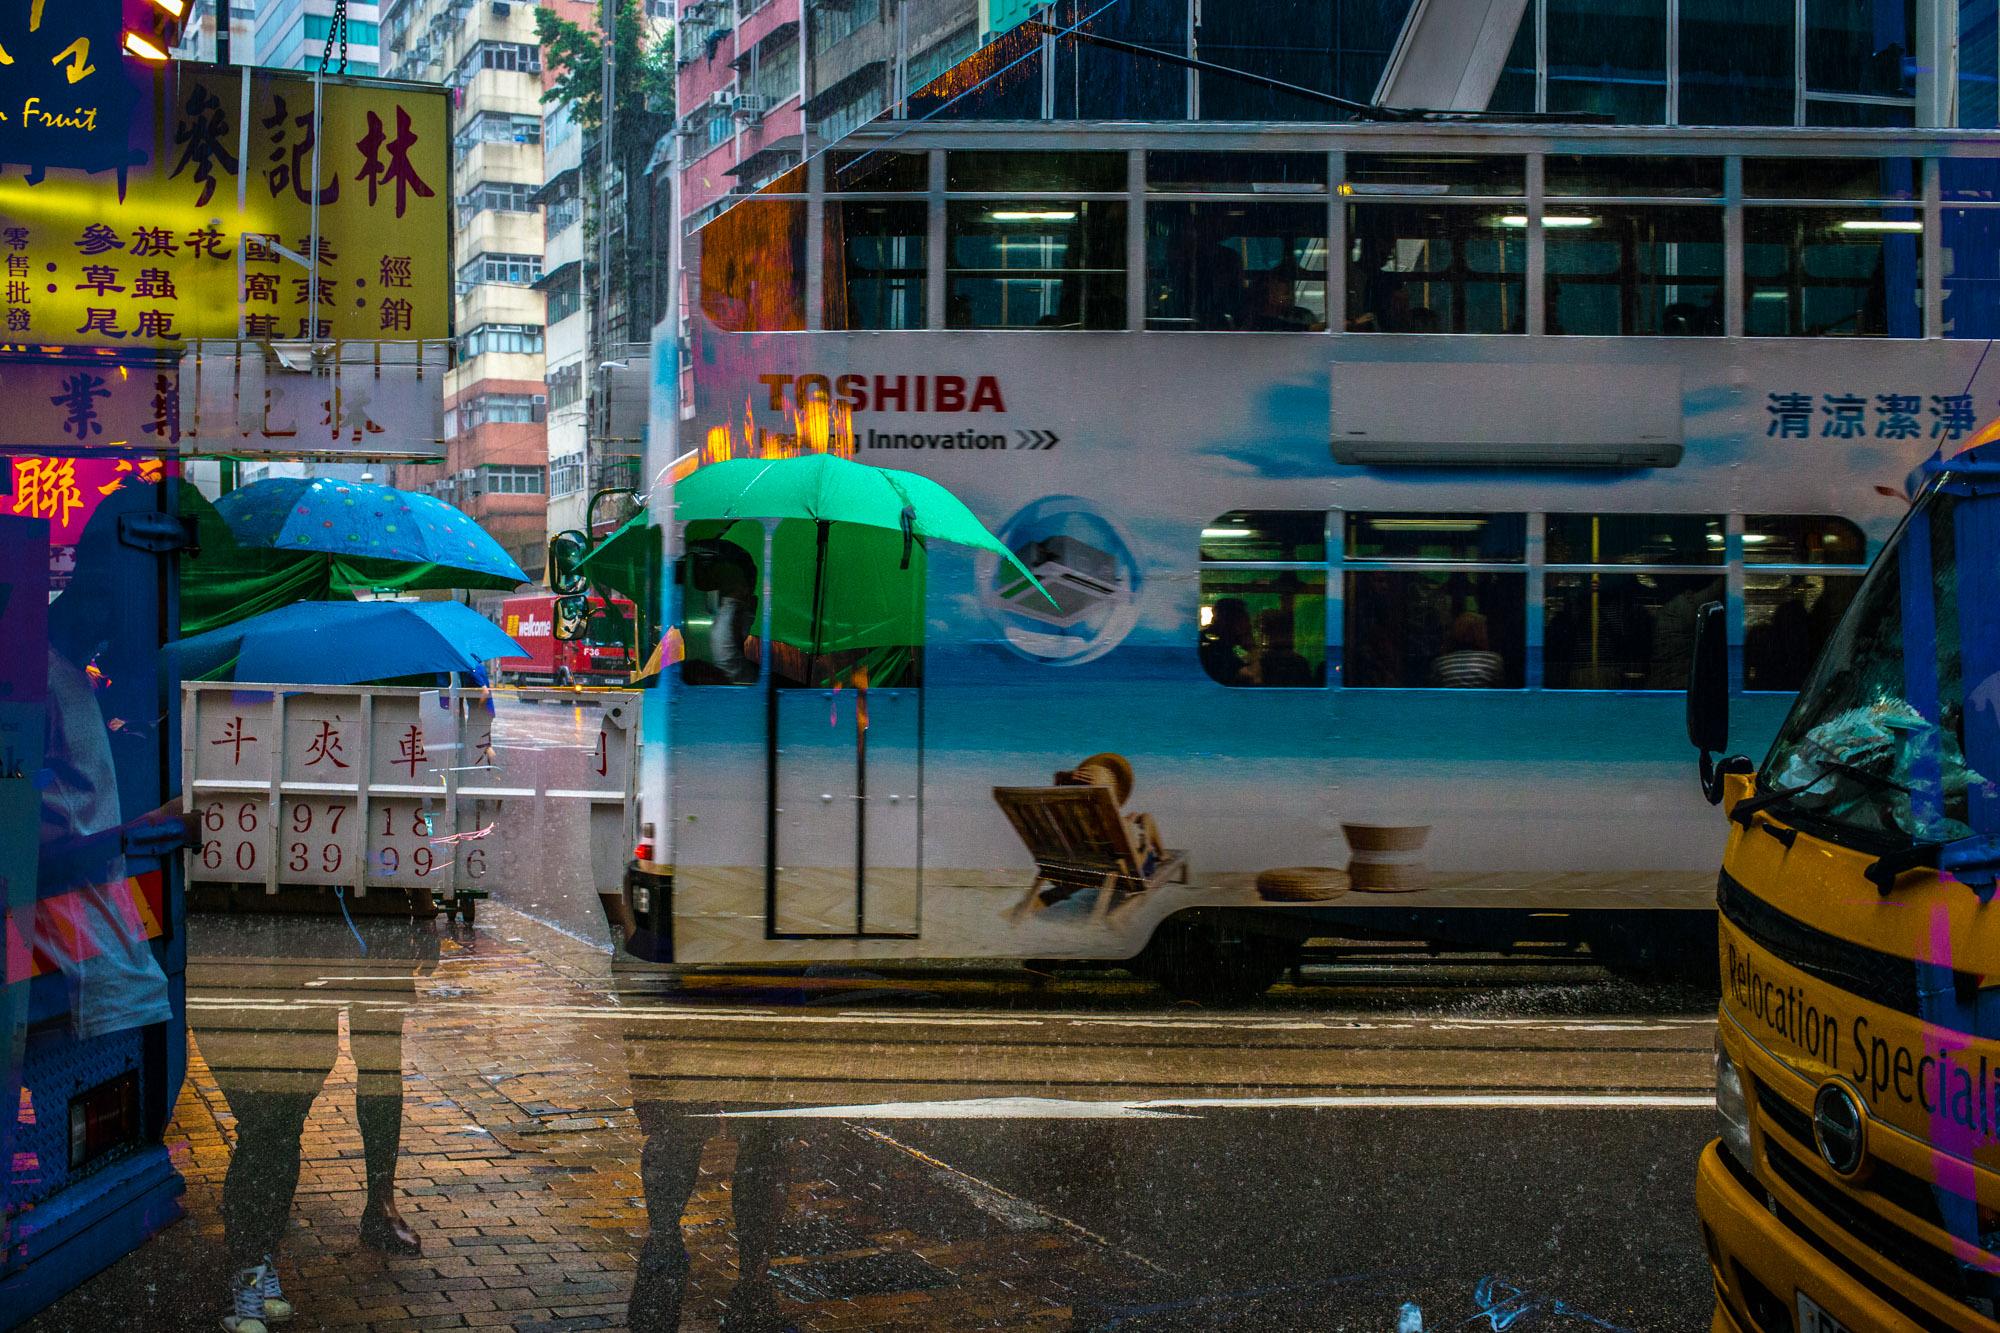 Ellen_Friedlander_Hong Kong Multiple Exposure_2017 -0091.jpg